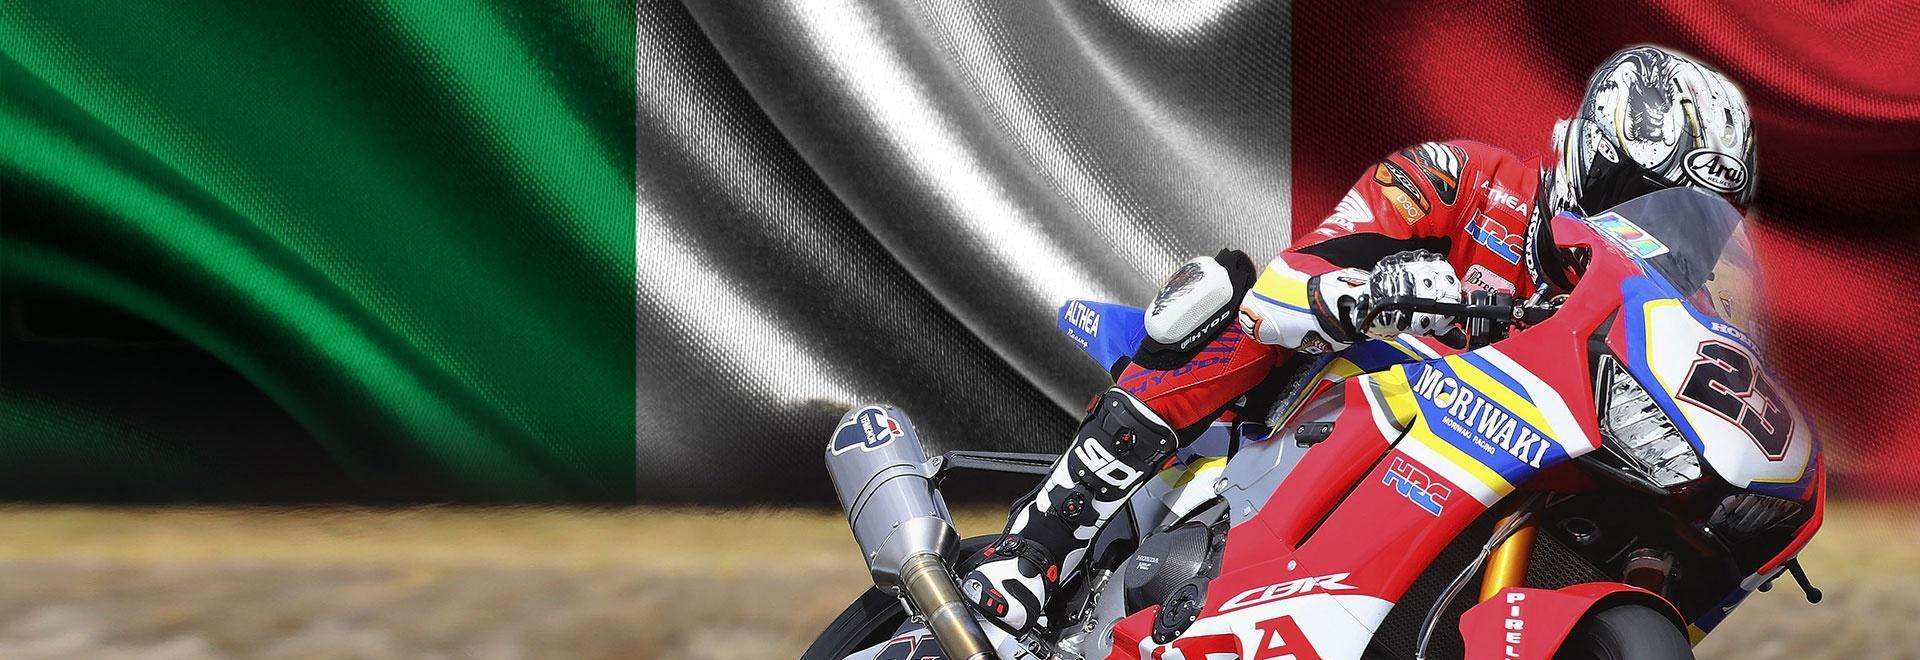 Italia. Superpole Race